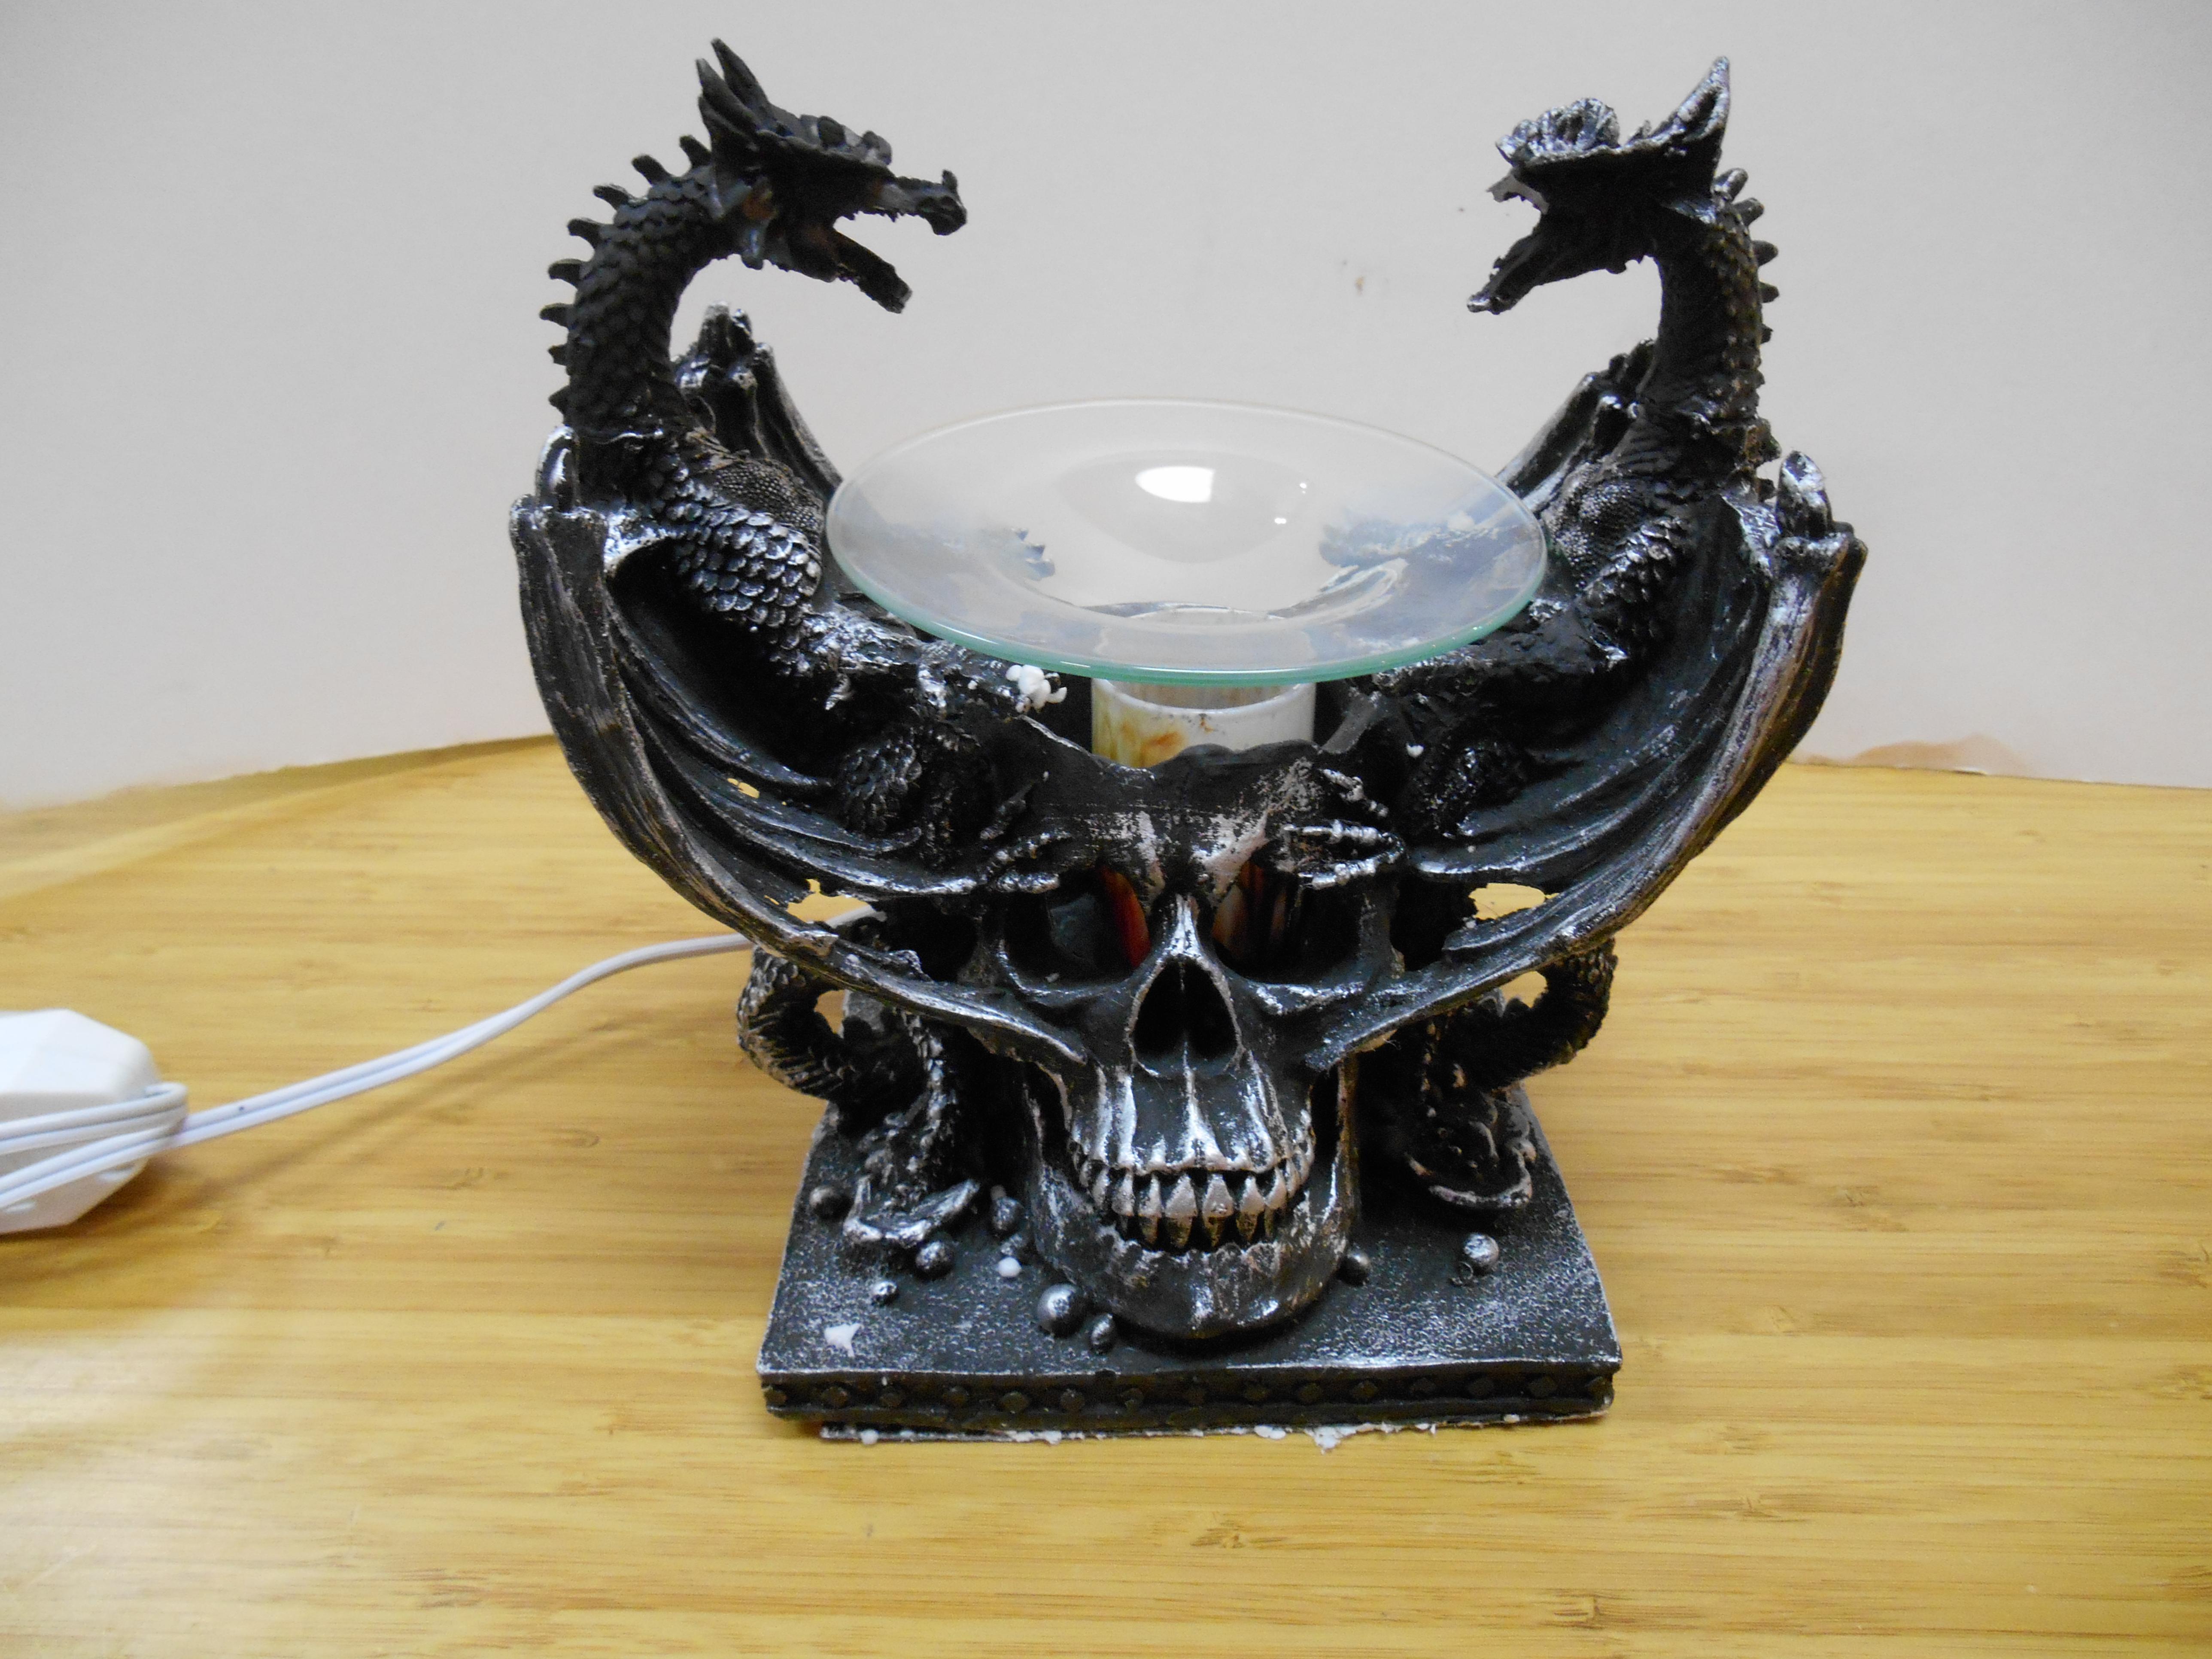 Electric Black Double Dragon oil warmer or tart burner, fully detailed